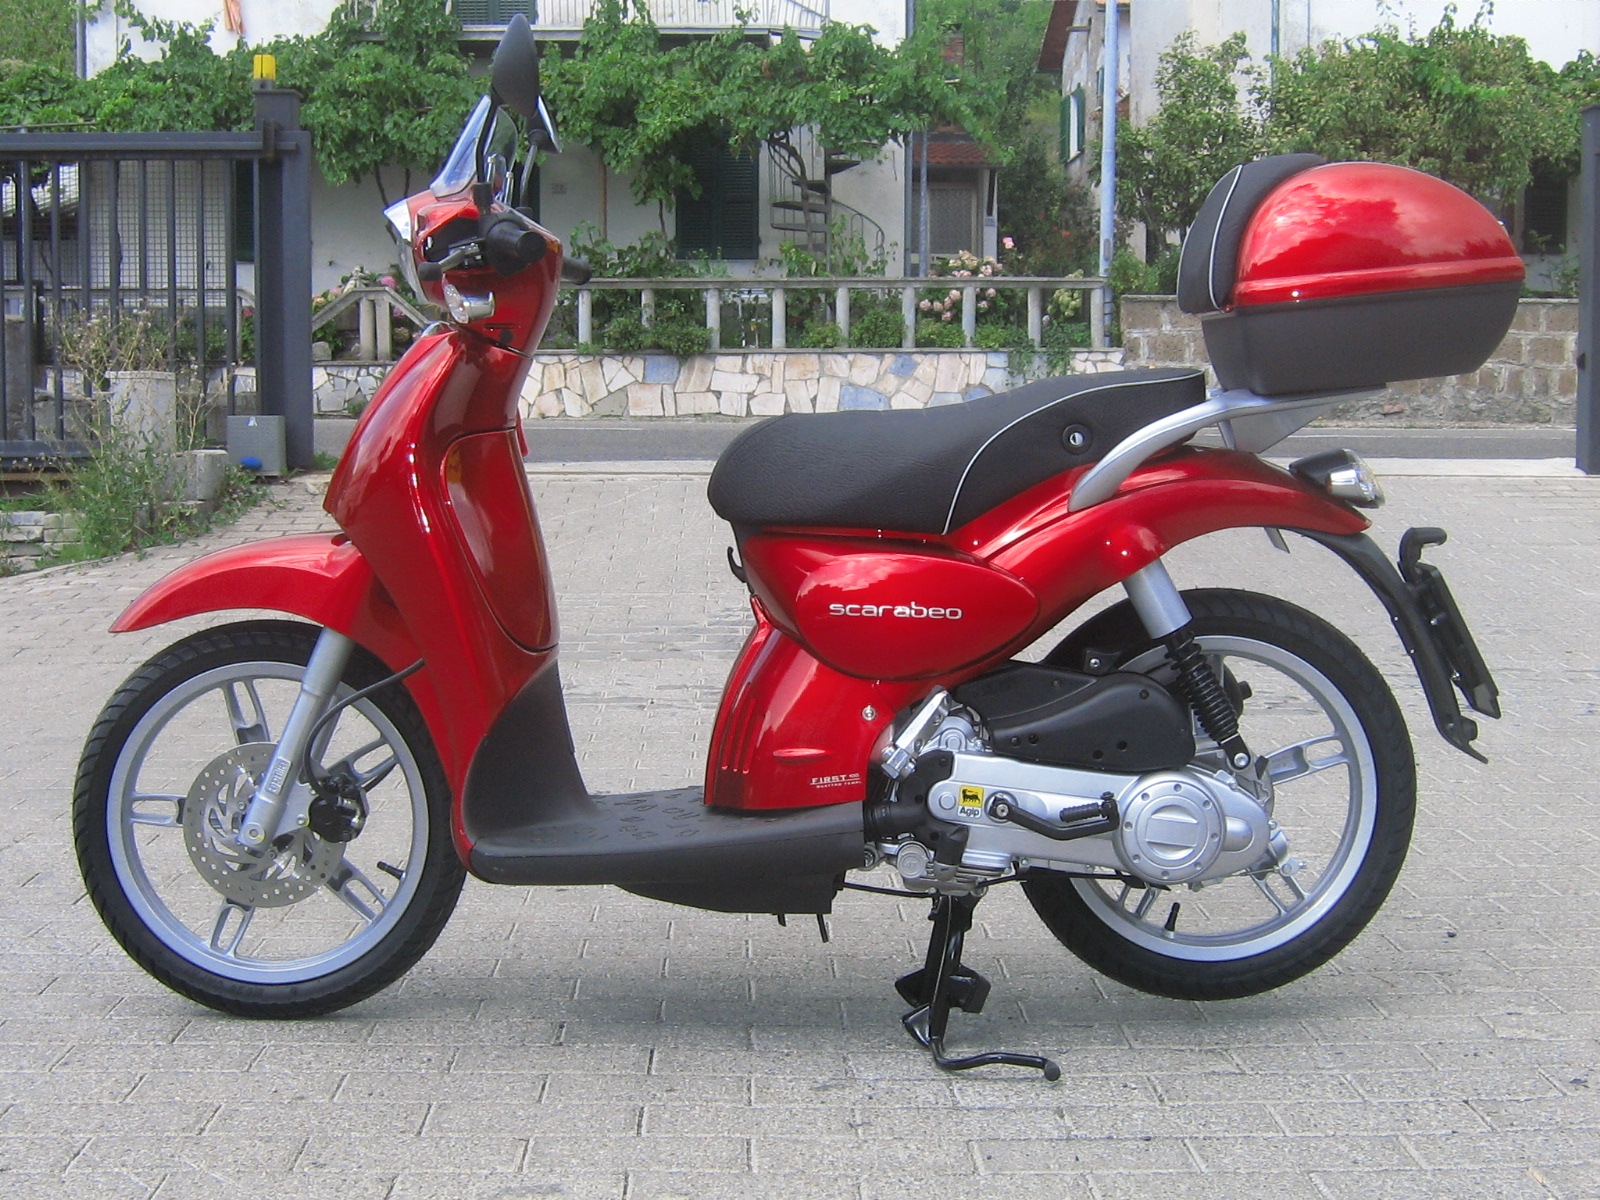 APRILIA SCARABEO 100 engine